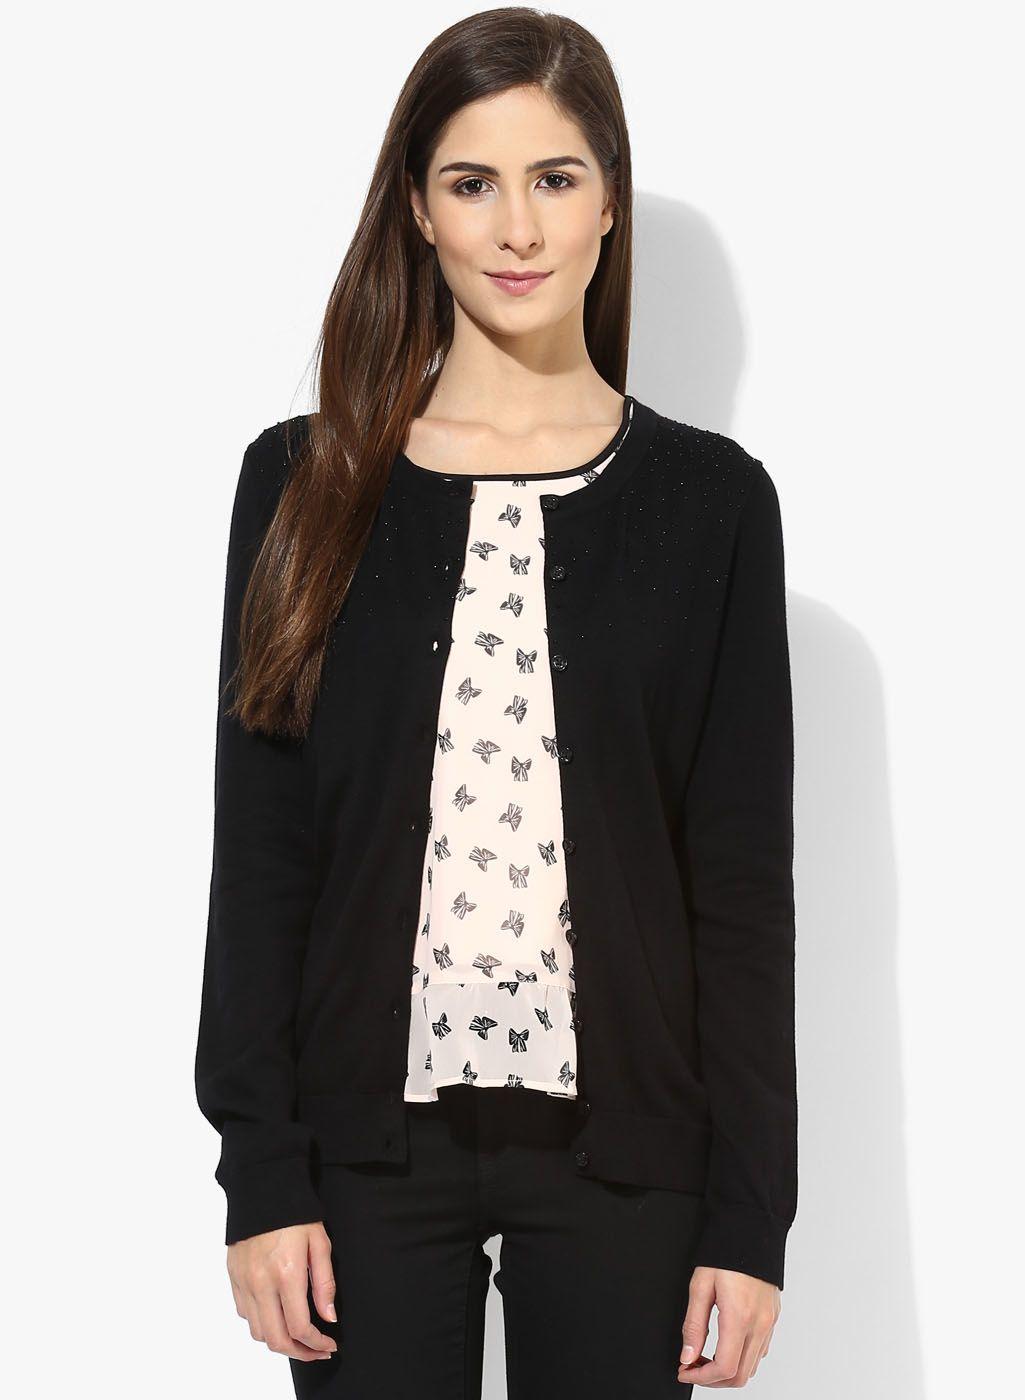 c34a16b10c Buy Tommy Hilfiger Black Embellished Sweater for Women Online India ...